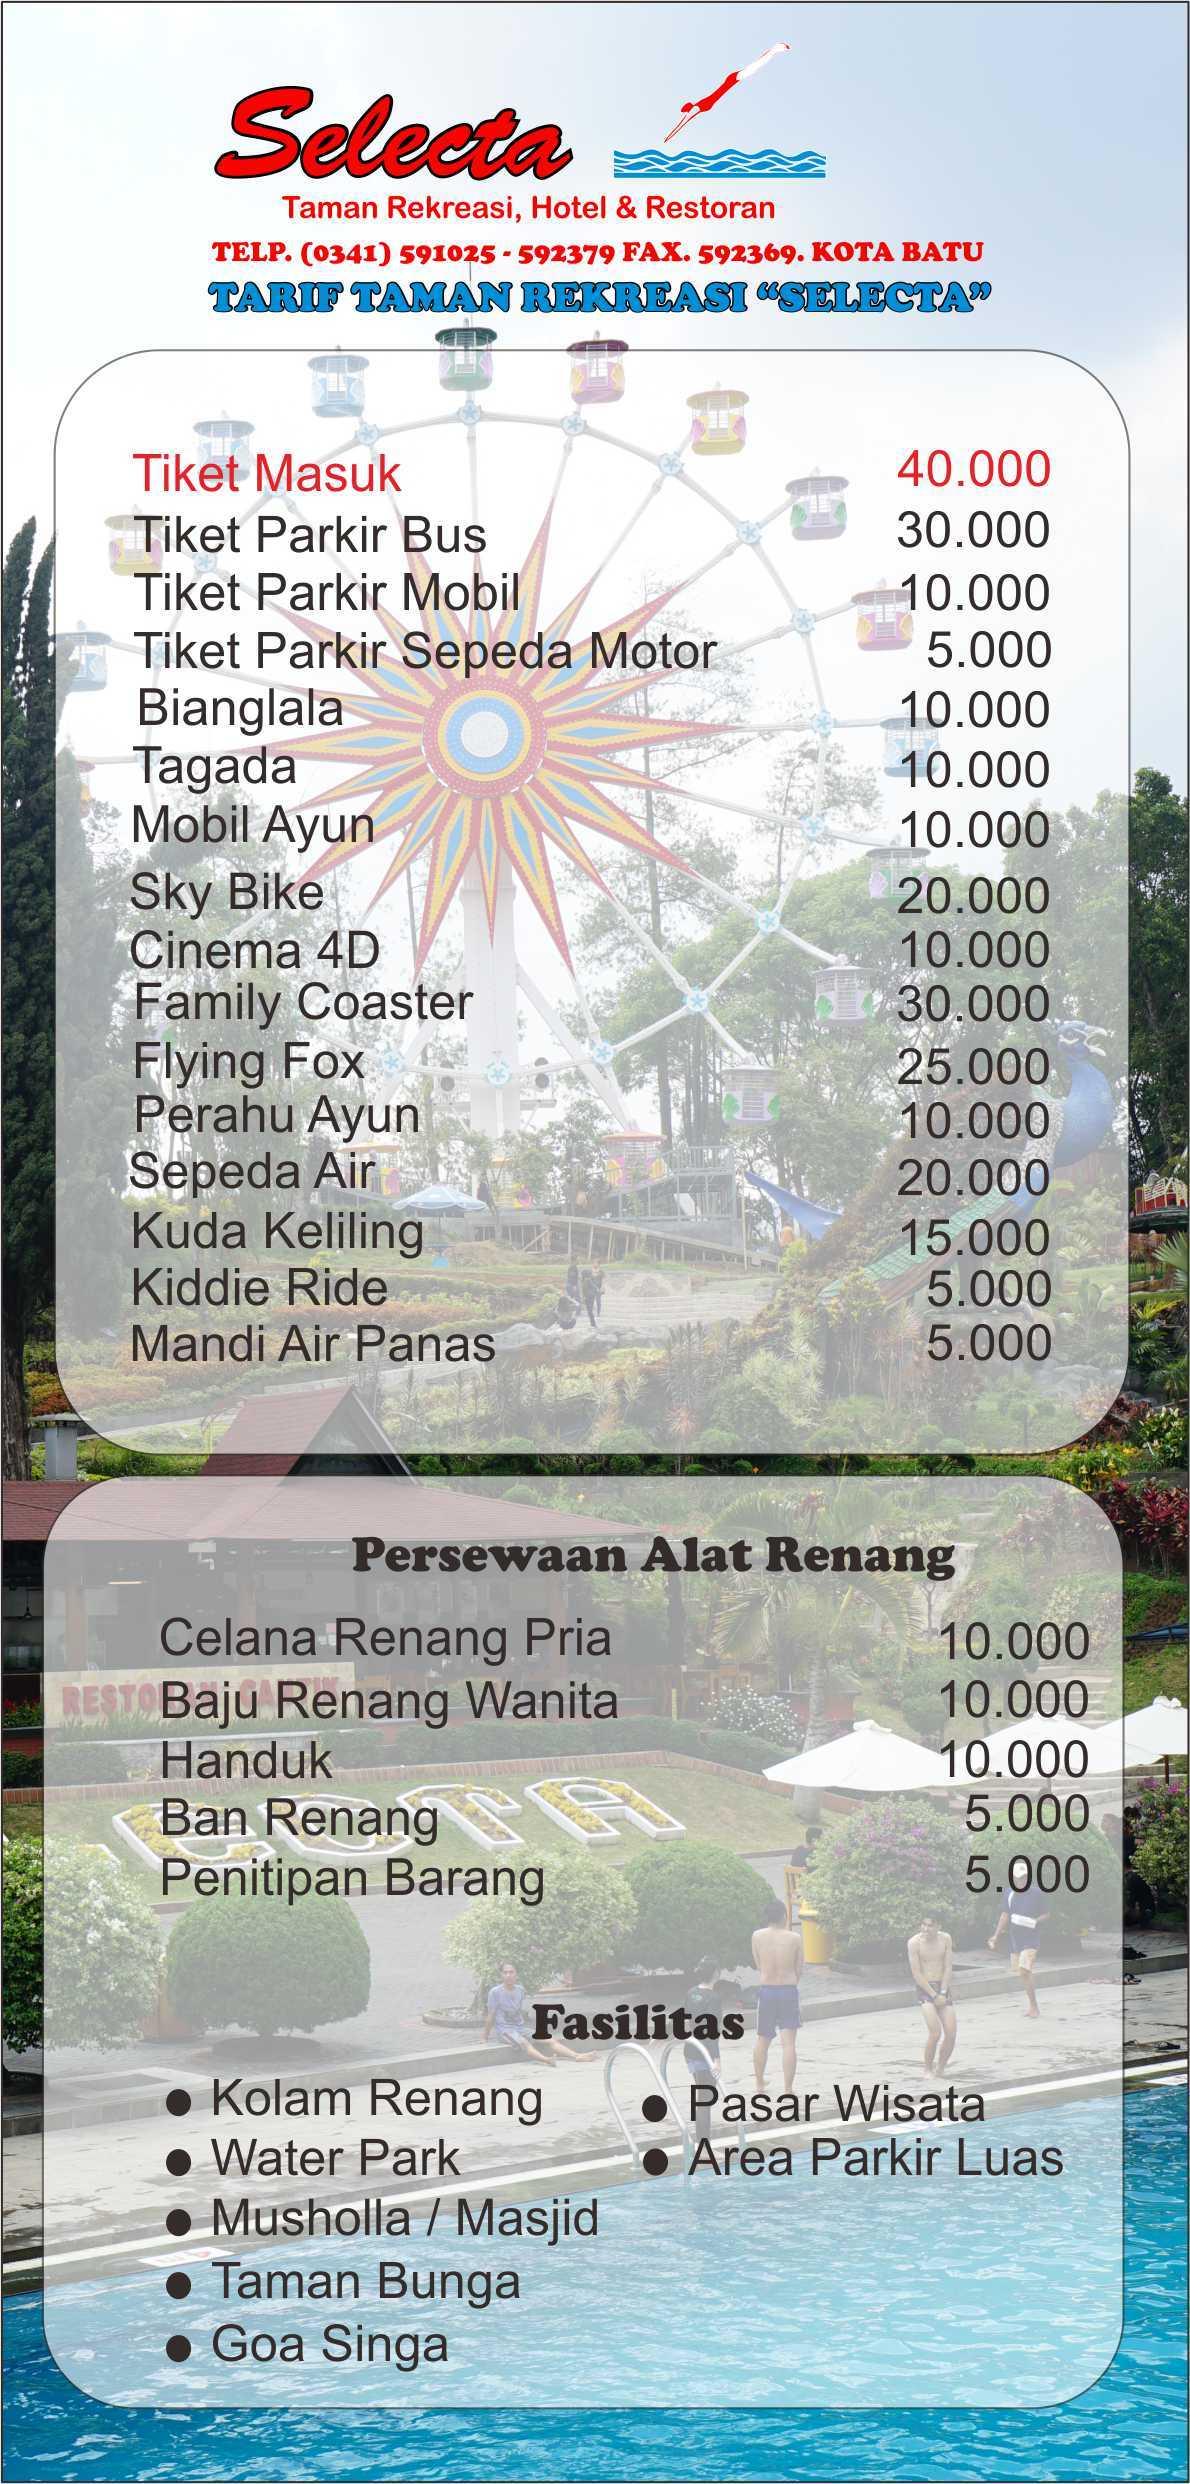 √ Fasilitas, Wahana, dan Harga Tiket Masuk Selecta Batu Malang 9